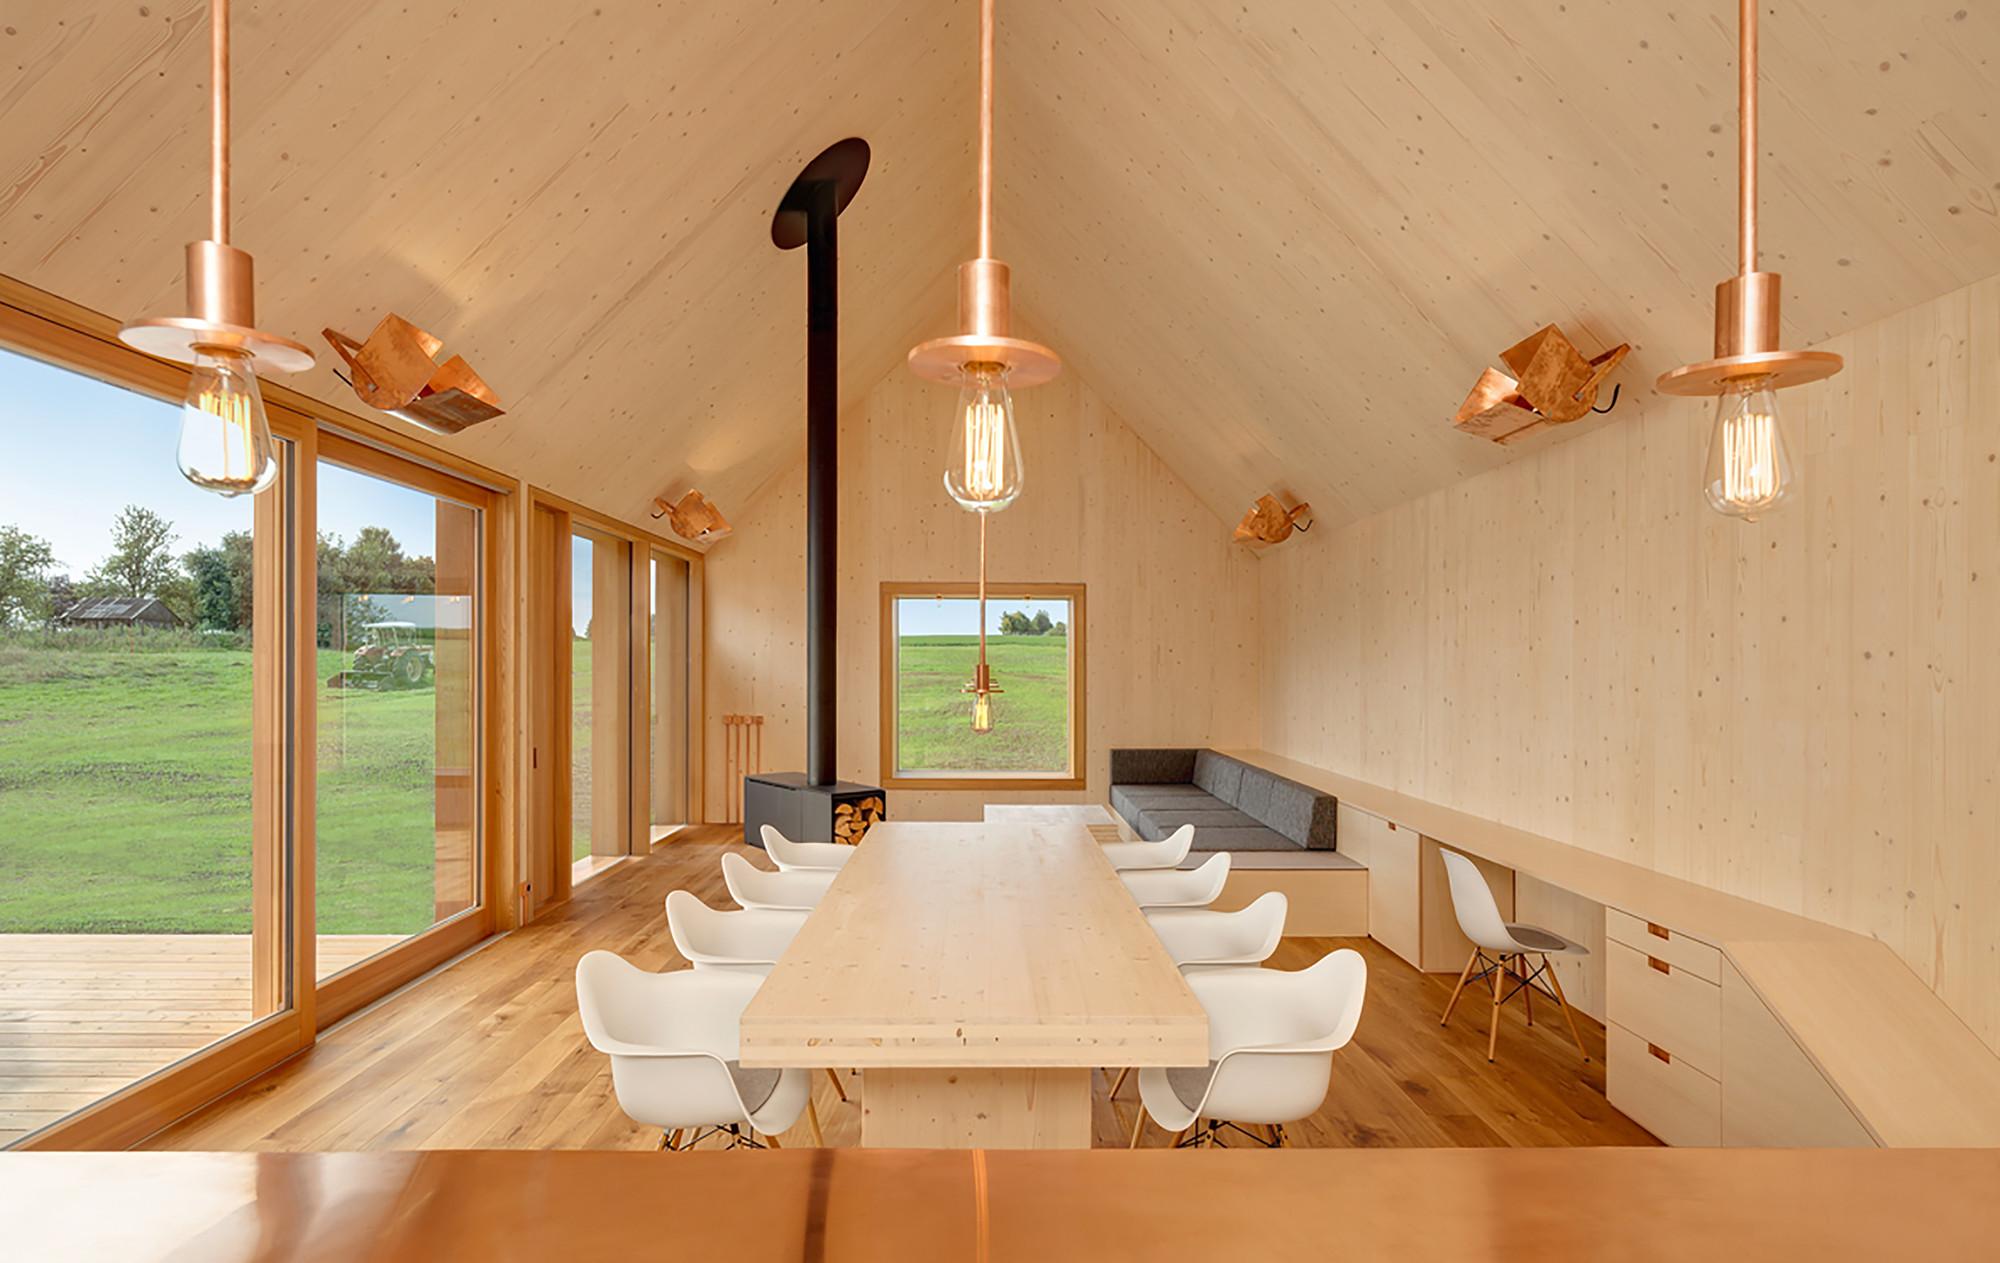 Gallery of Timber House / KÜHNLEIN Architektur - 9